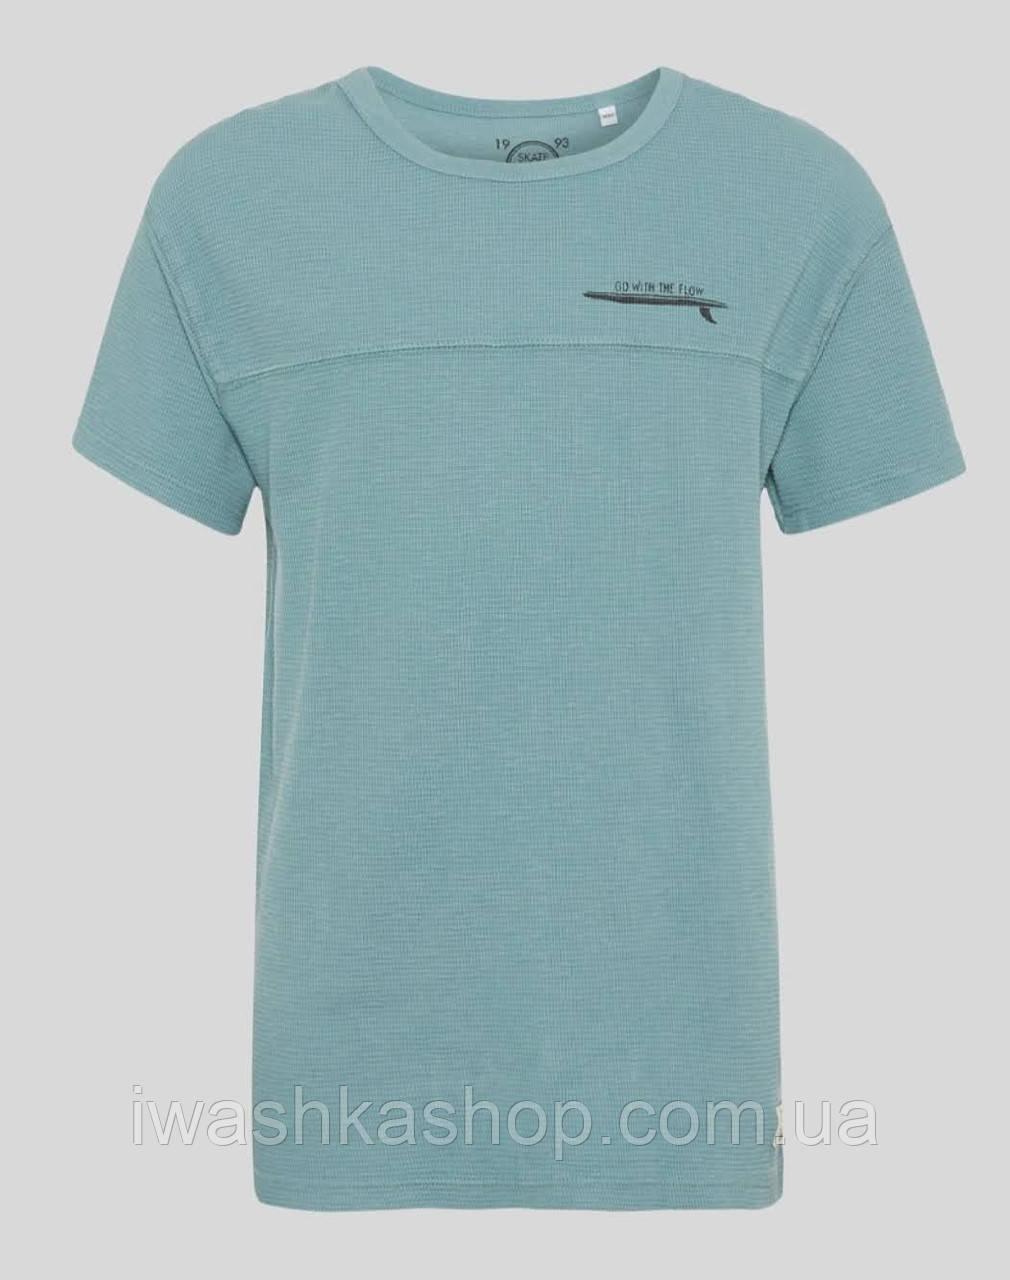 Стильная футболка из ребристого трикотажа на мальчика 6 - 8 лет, р. 122-128, here+there / C&A